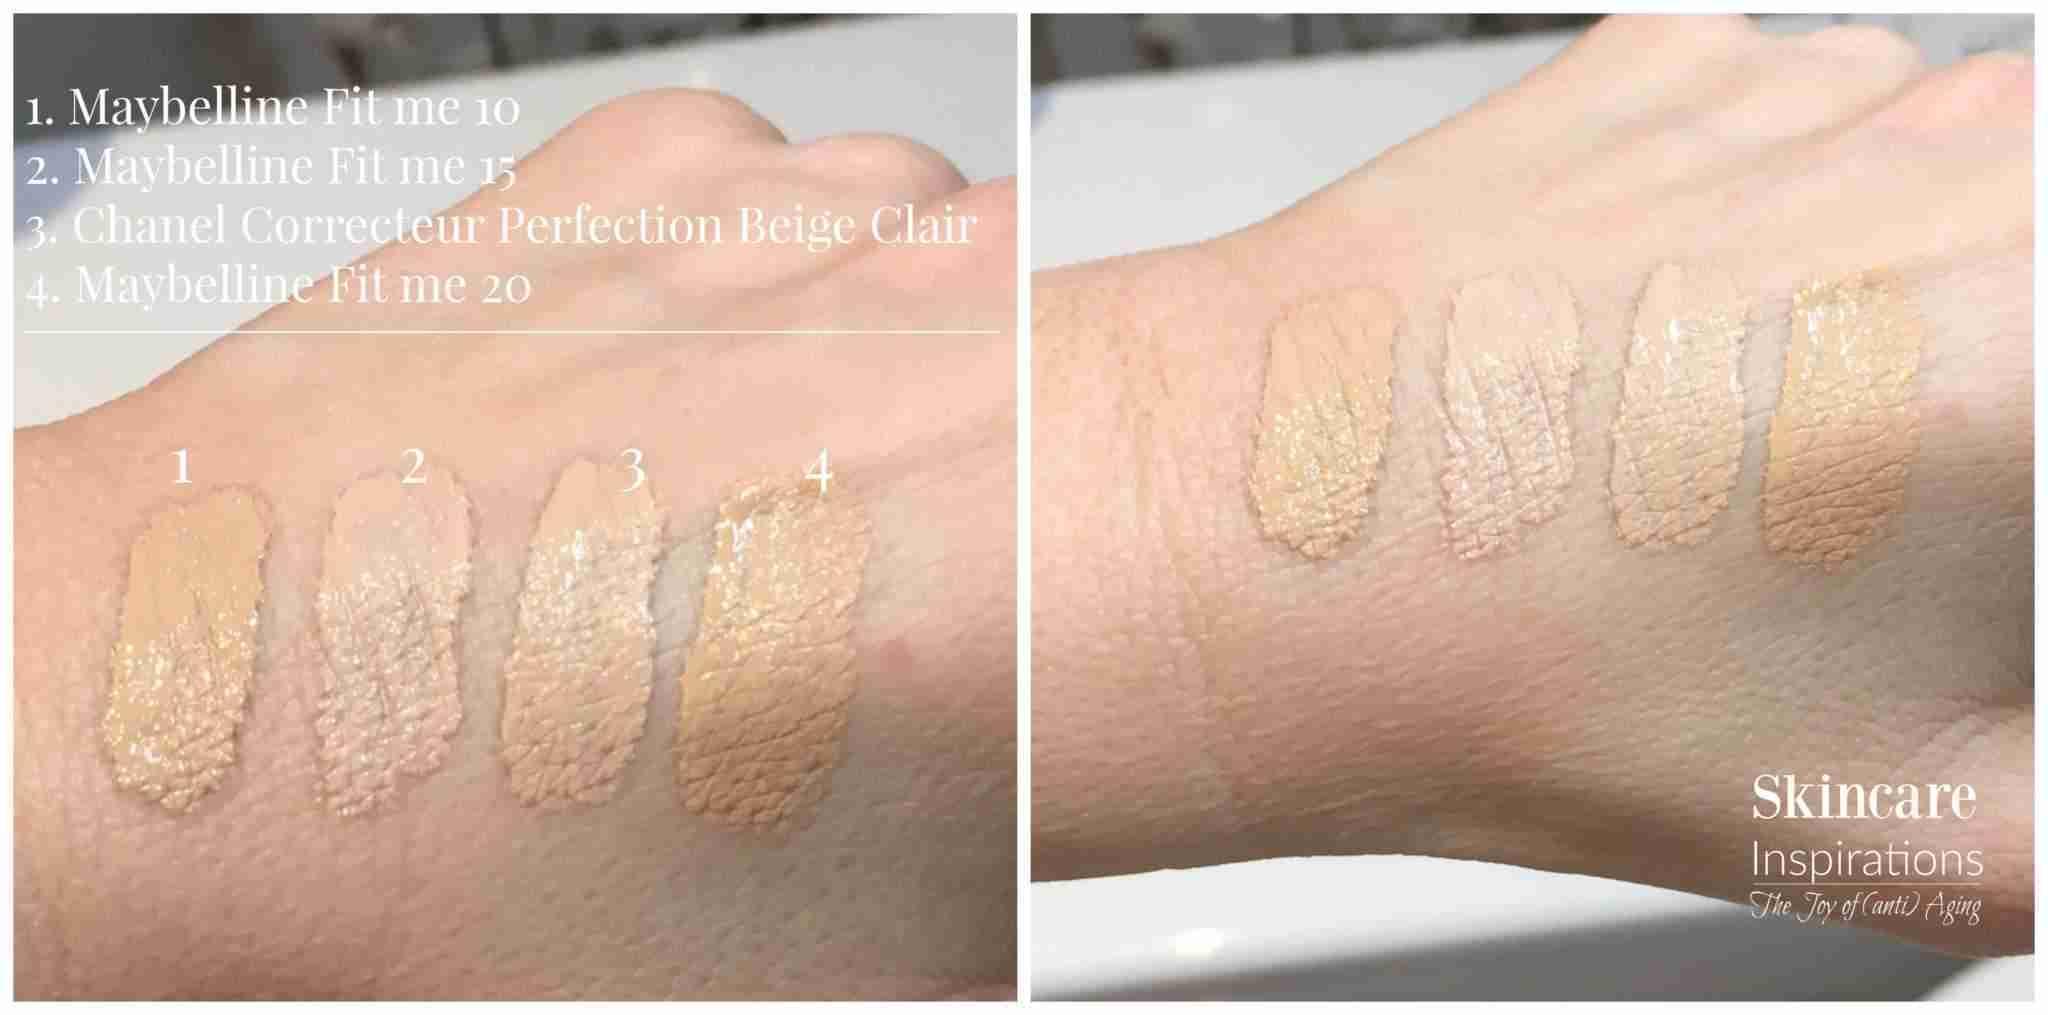 Maybelline Fit Me Concealer Vs Chanel Correcteur Perfection Swatches Versus